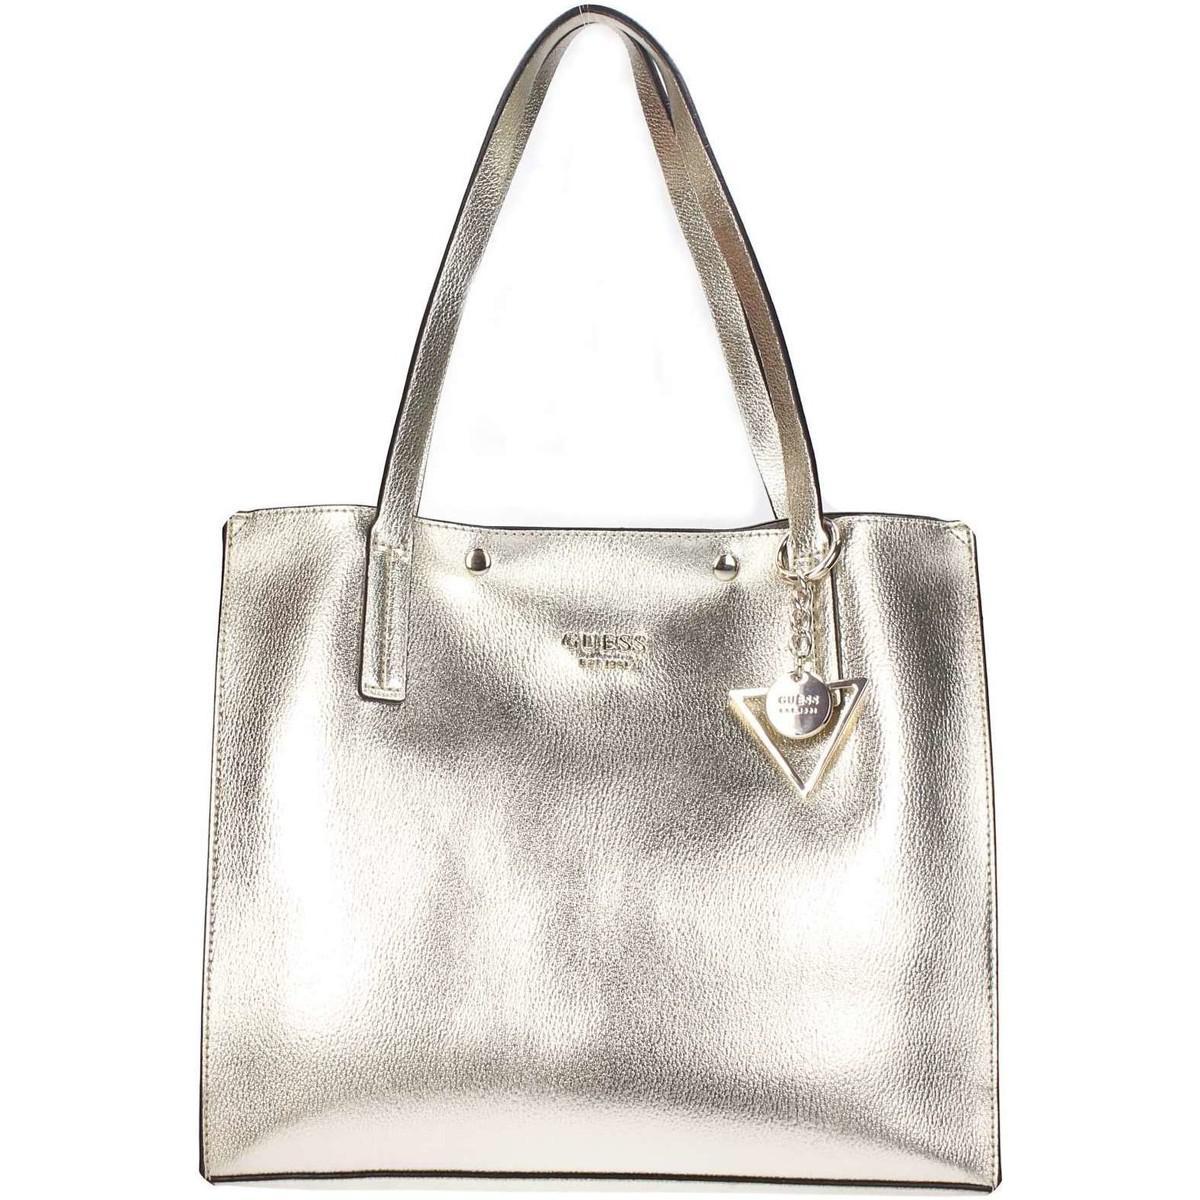 Guess shopping bag womens shopper bag in gold jpg 1200x1200 Gold guess bag 93c9ce72bf9bc